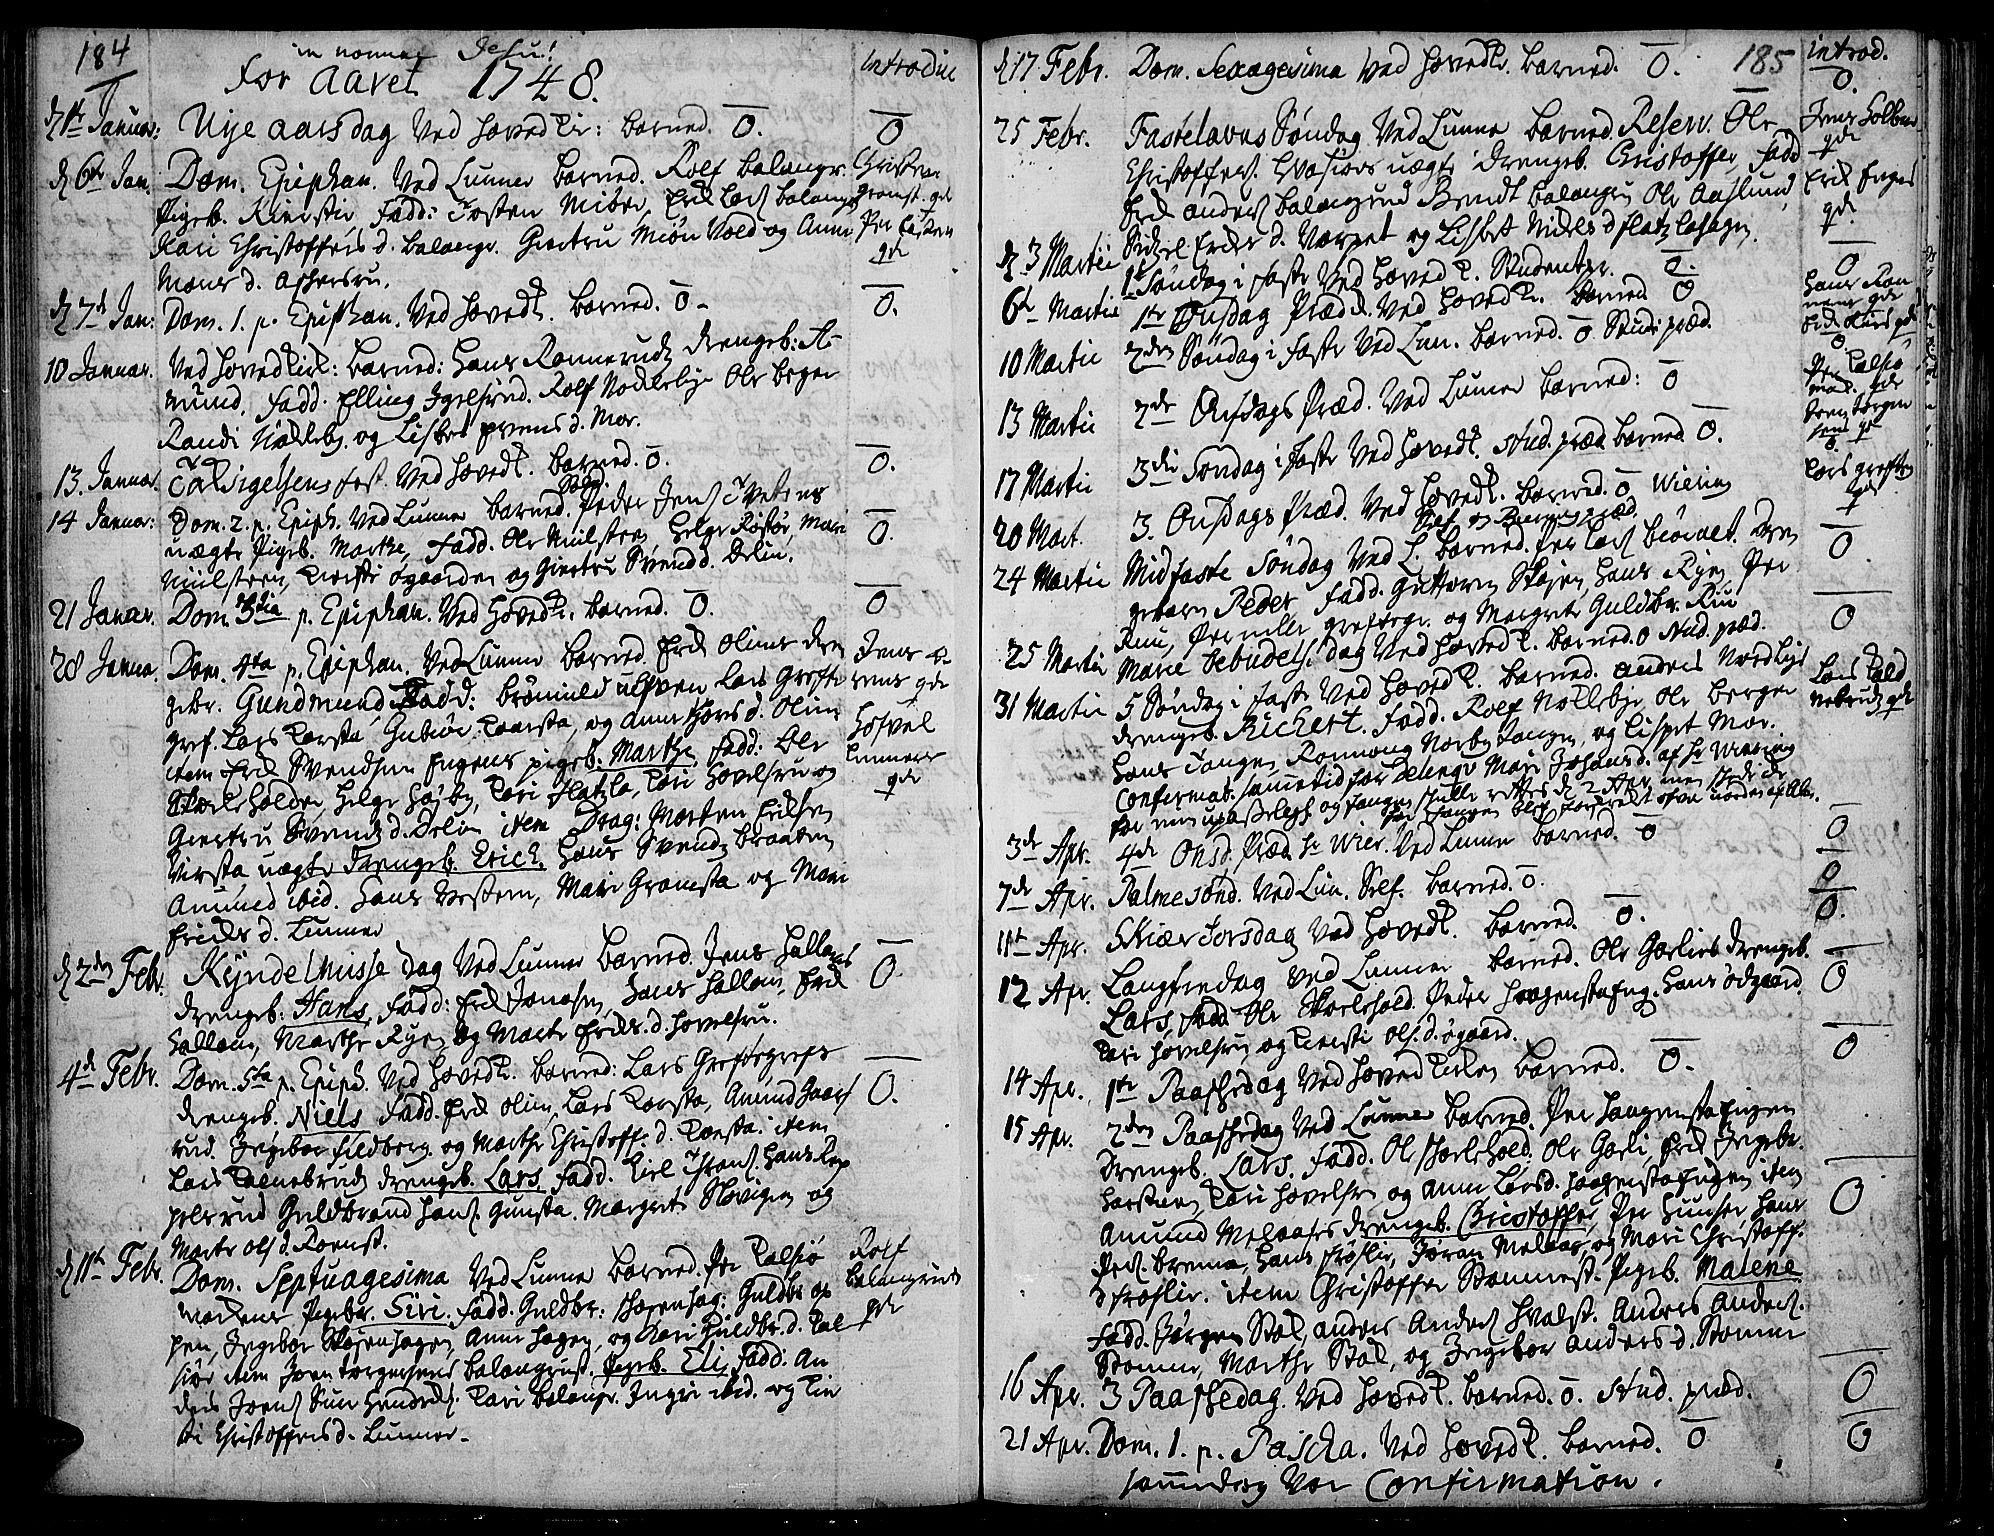 SAH, Jevnaker prestekontor, Ministerialbok nr. 2, 1725-1751, s. 184-185